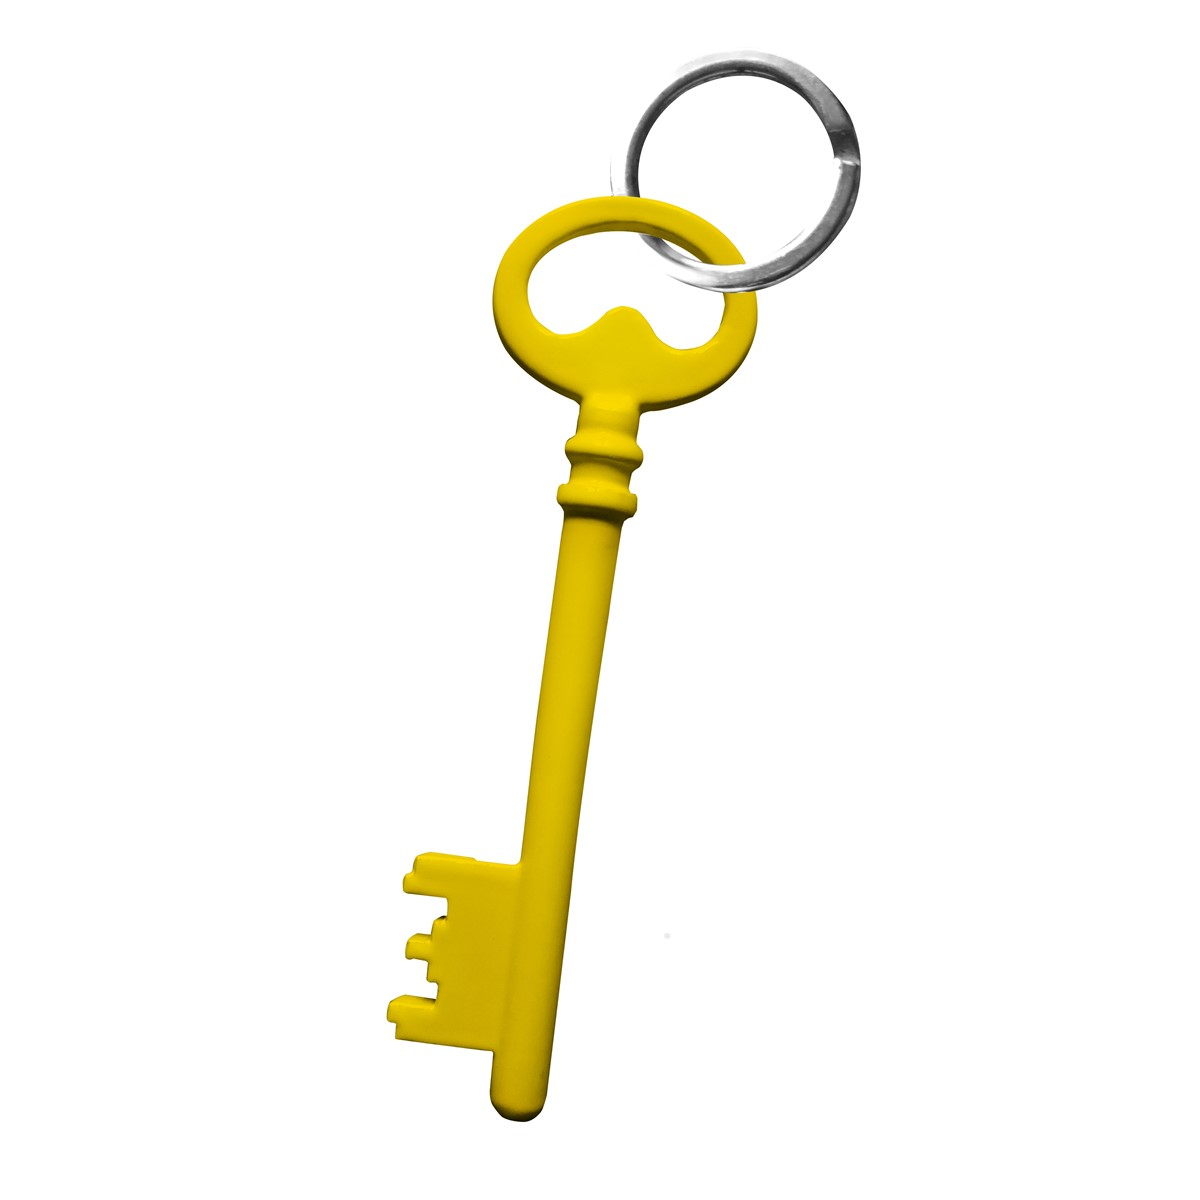 Porte clefs en acier jaune